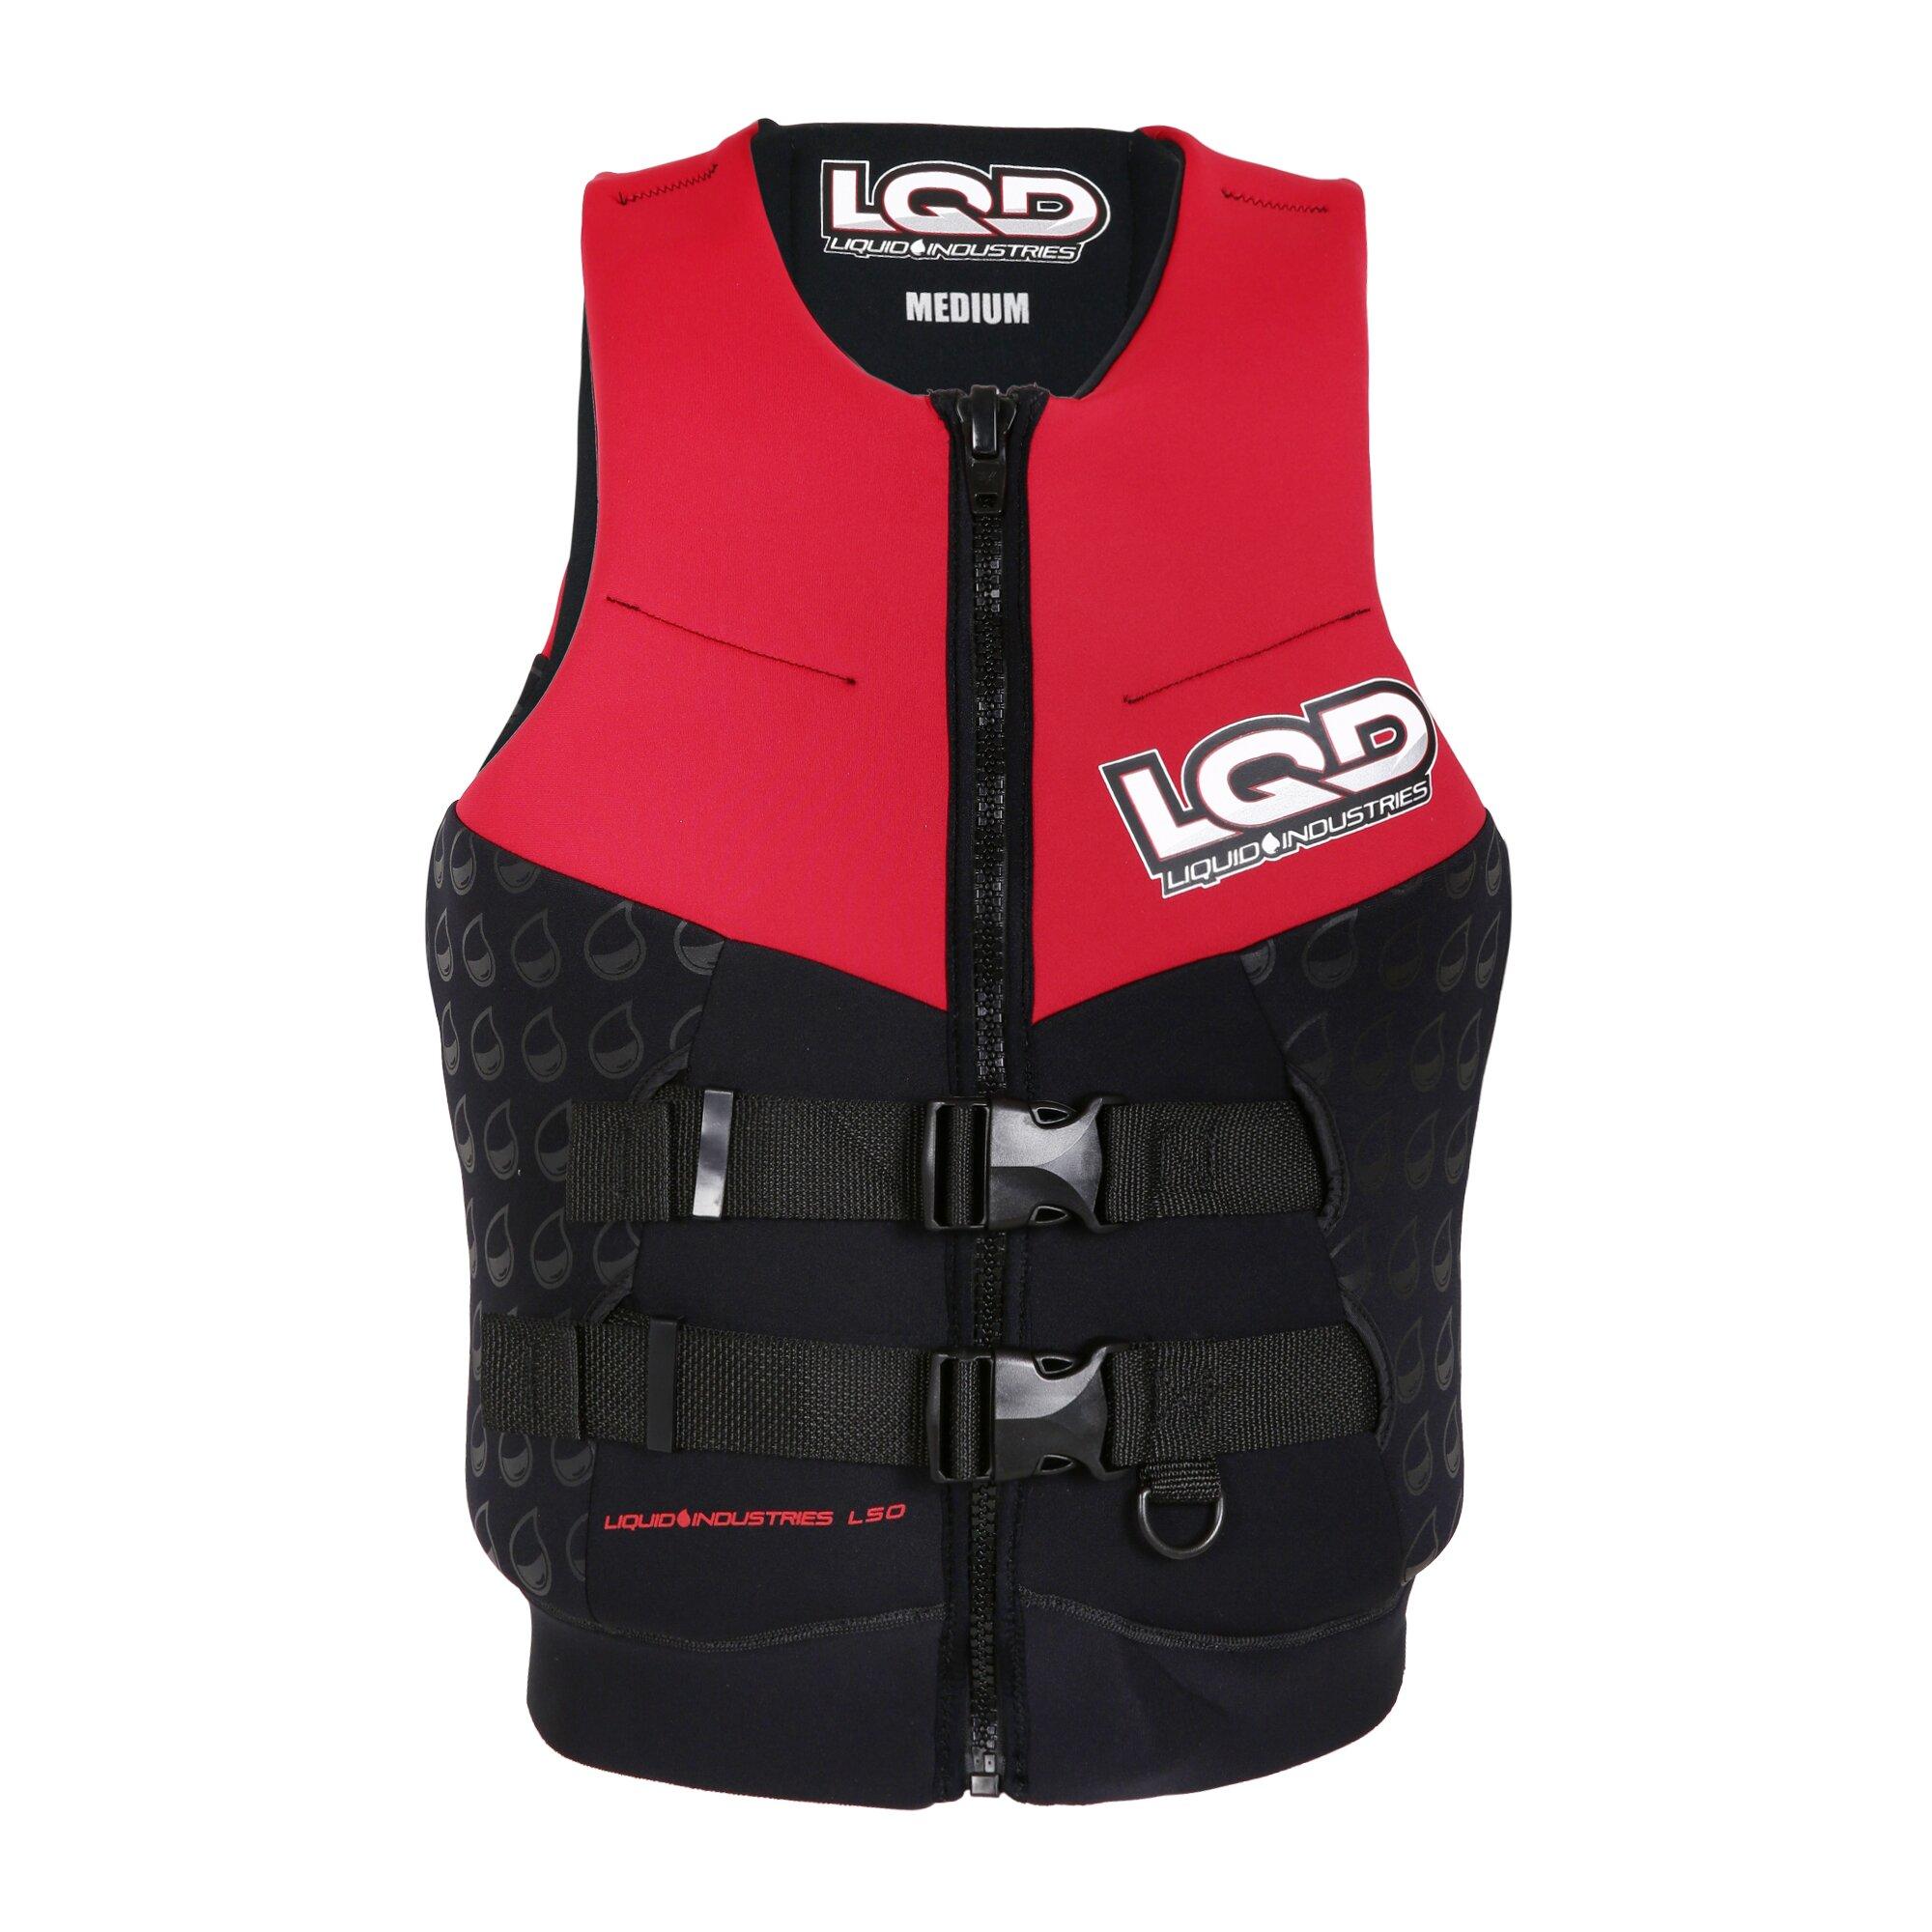 liquid-industries-l50_01